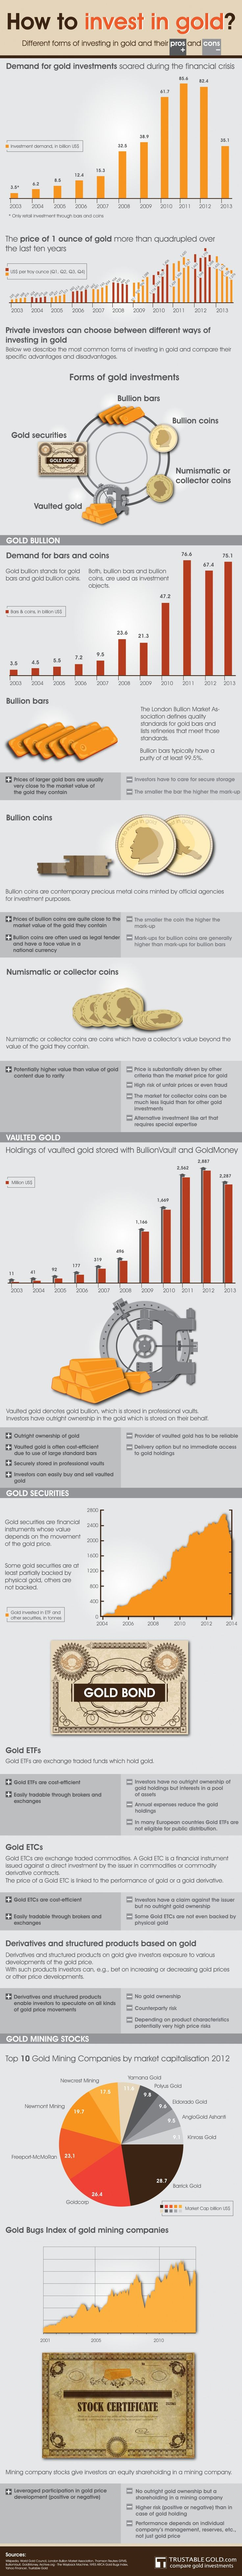 How to Invest in Gold? Infographic https://www.karatbars.com/?s=erlendgin